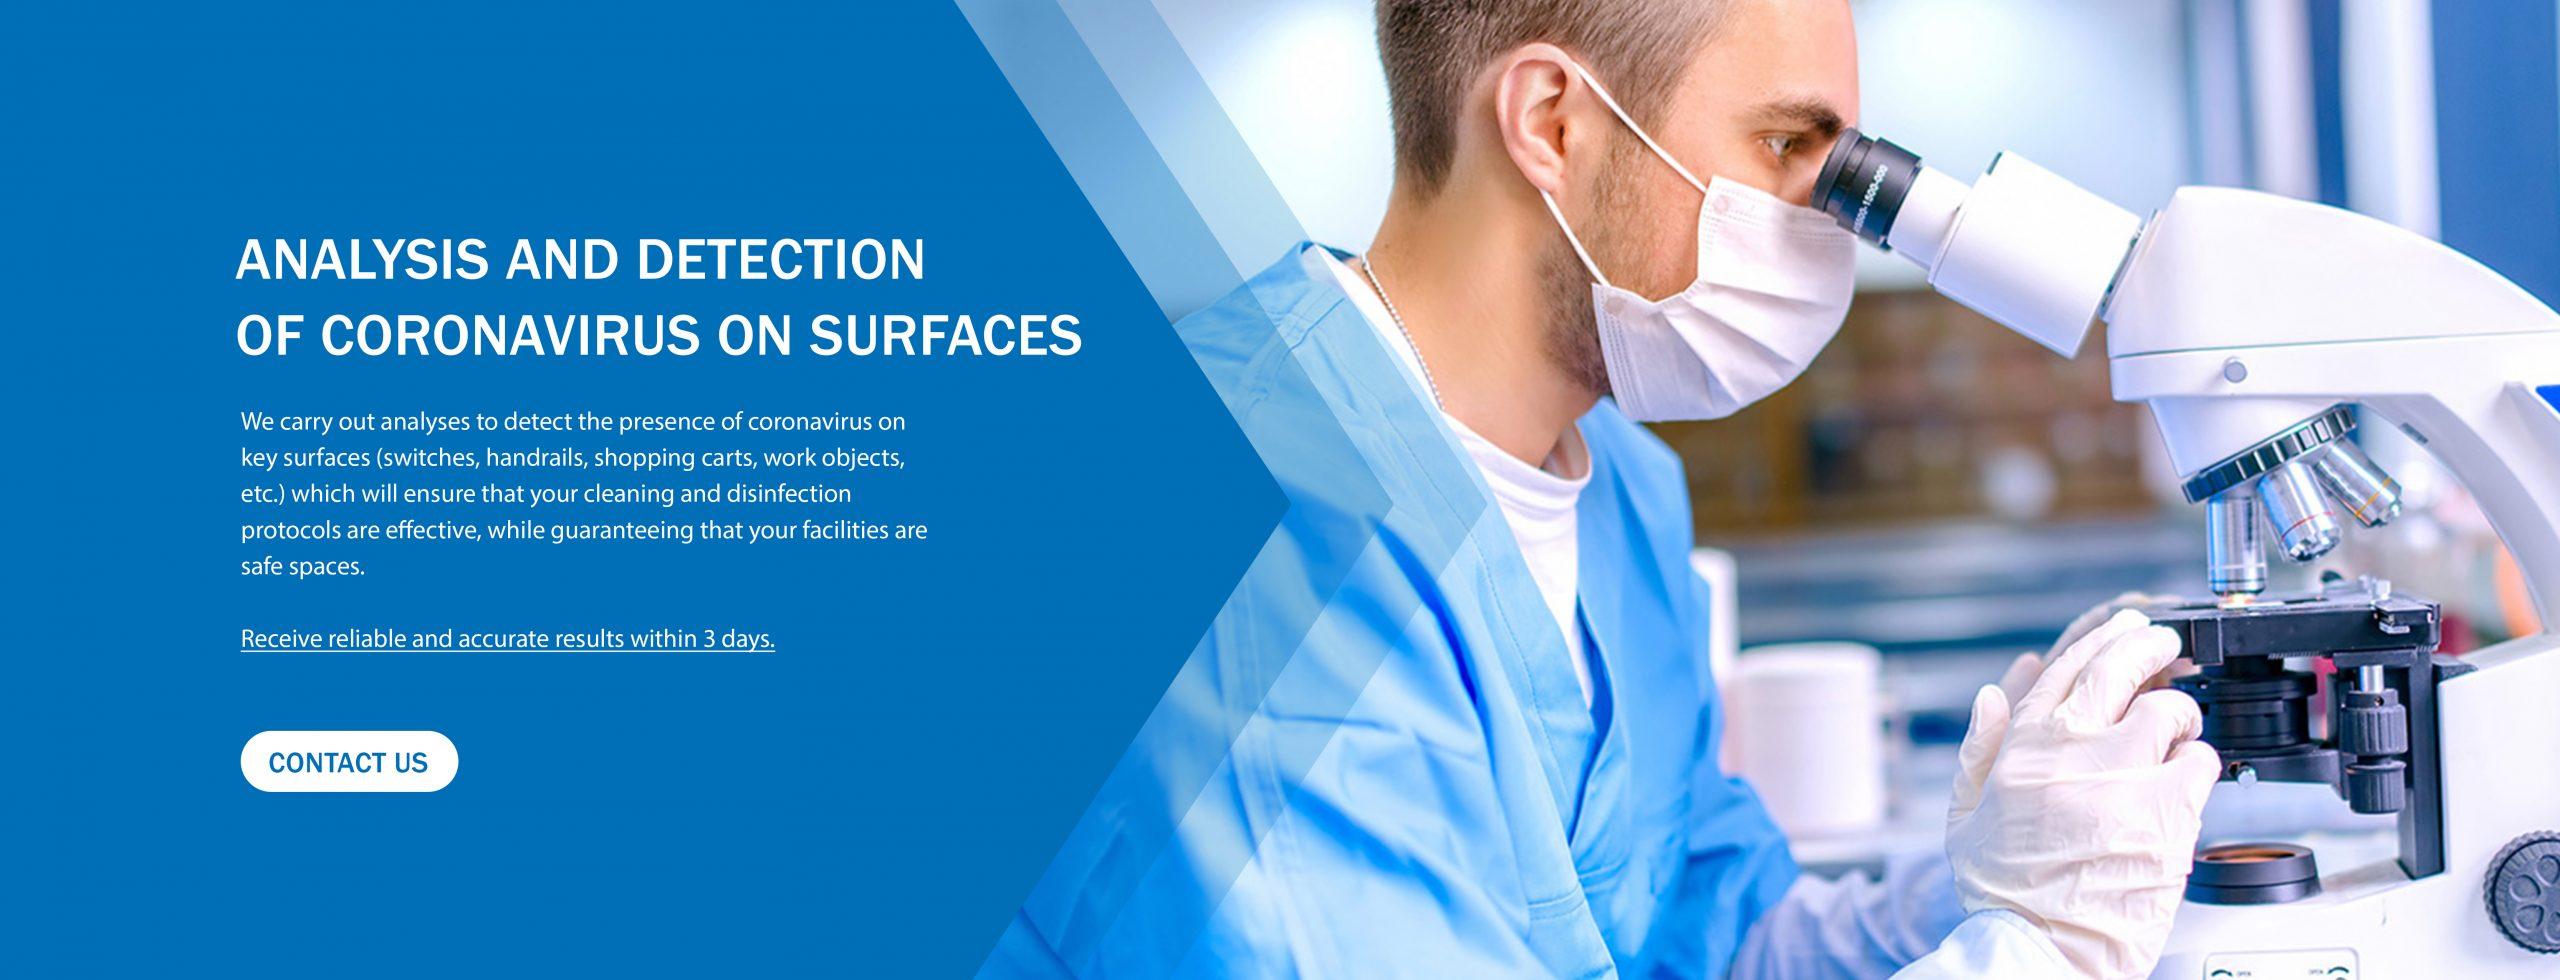 Analysis and detection of Coronavirus on surfaces